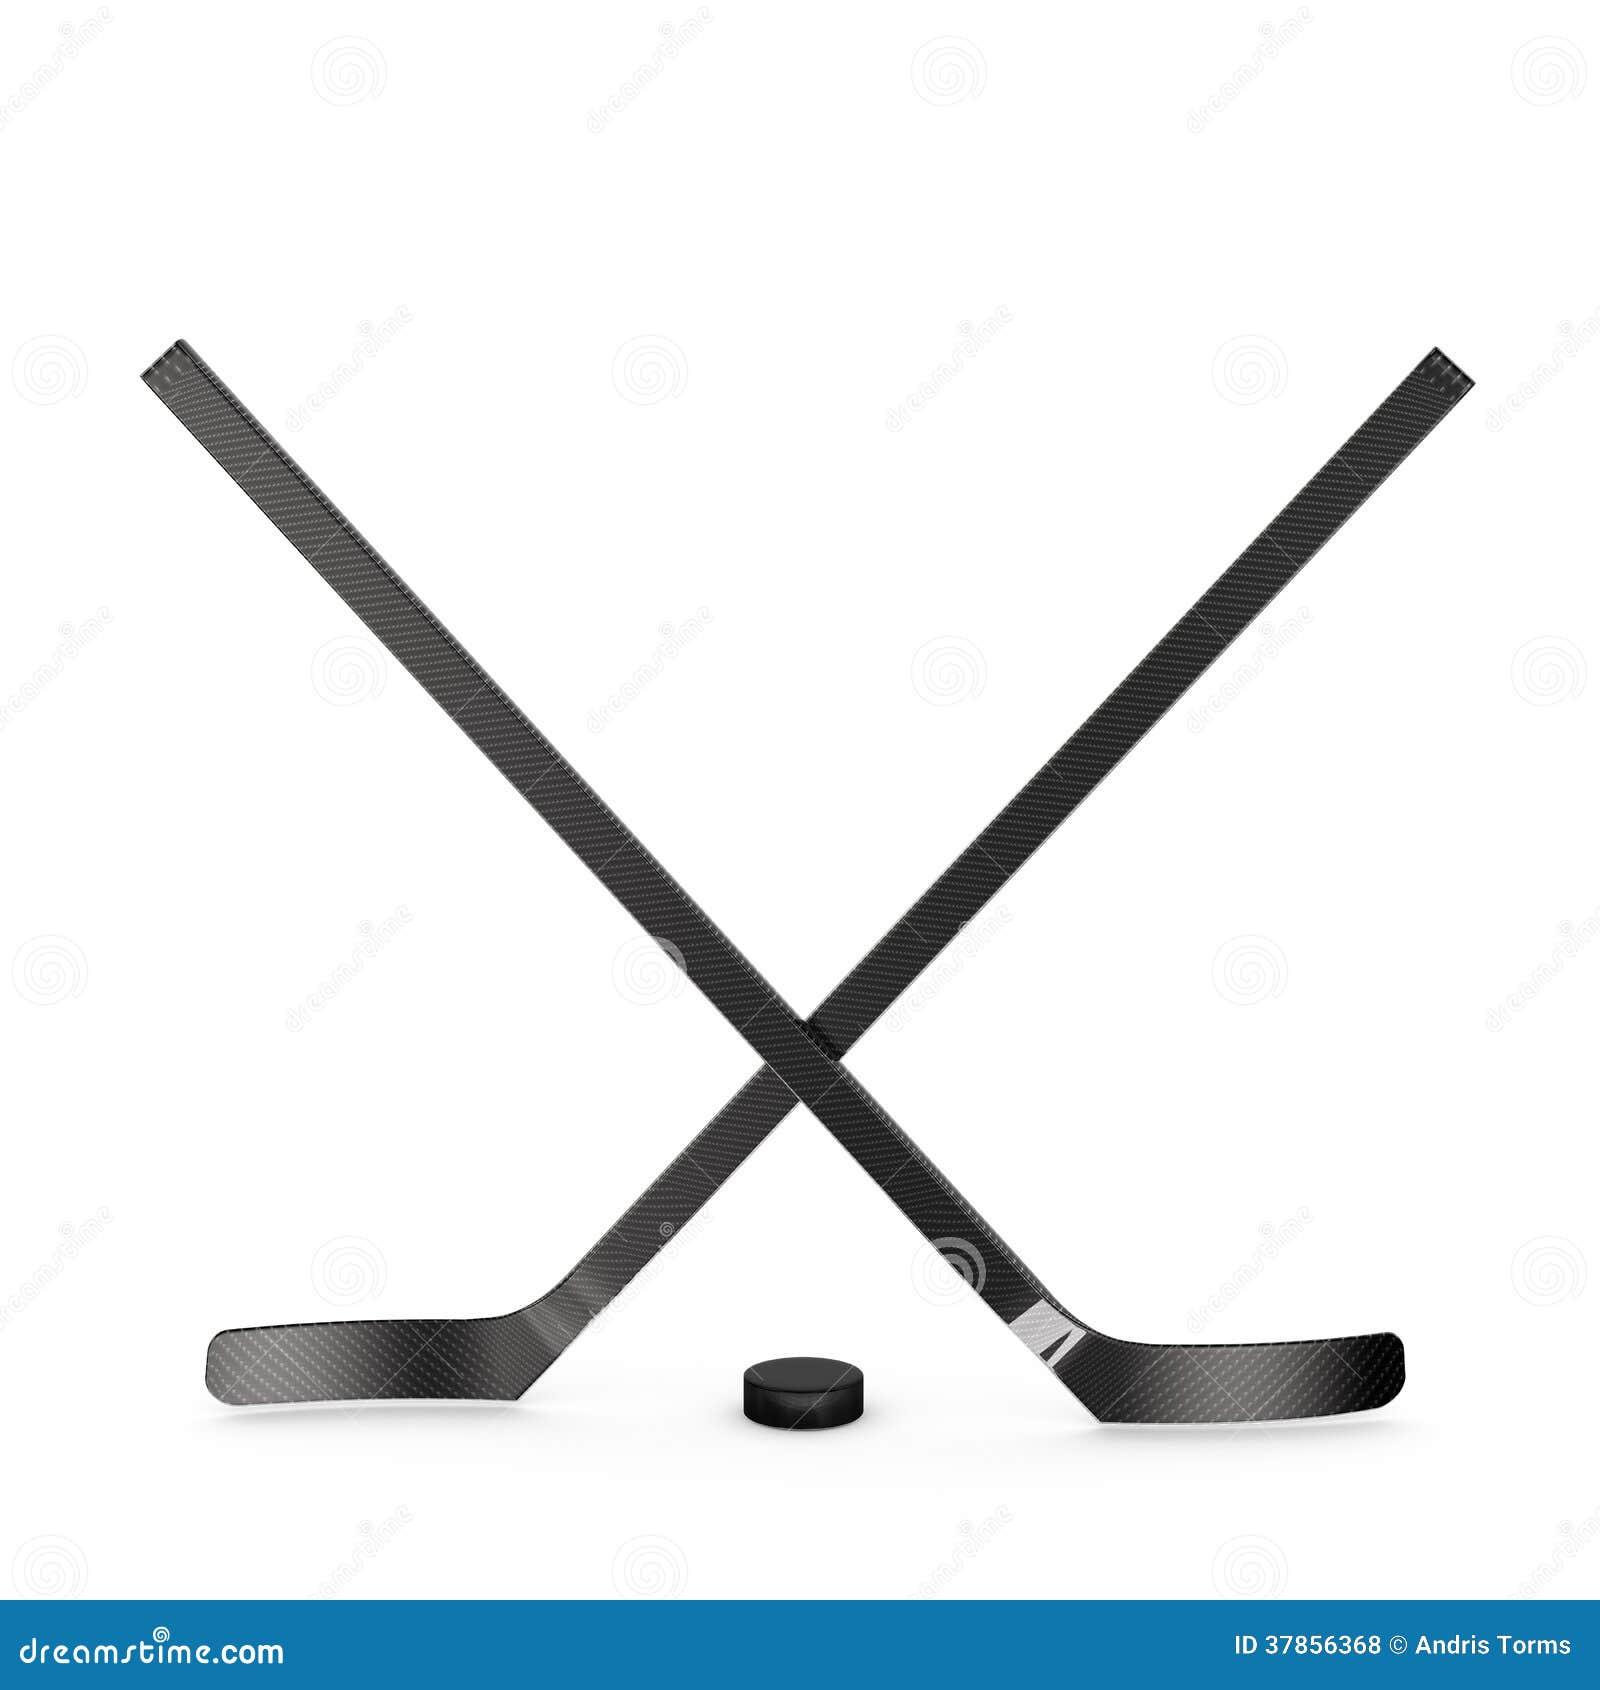 ice hockey sticks and puck stock photos image 5647683